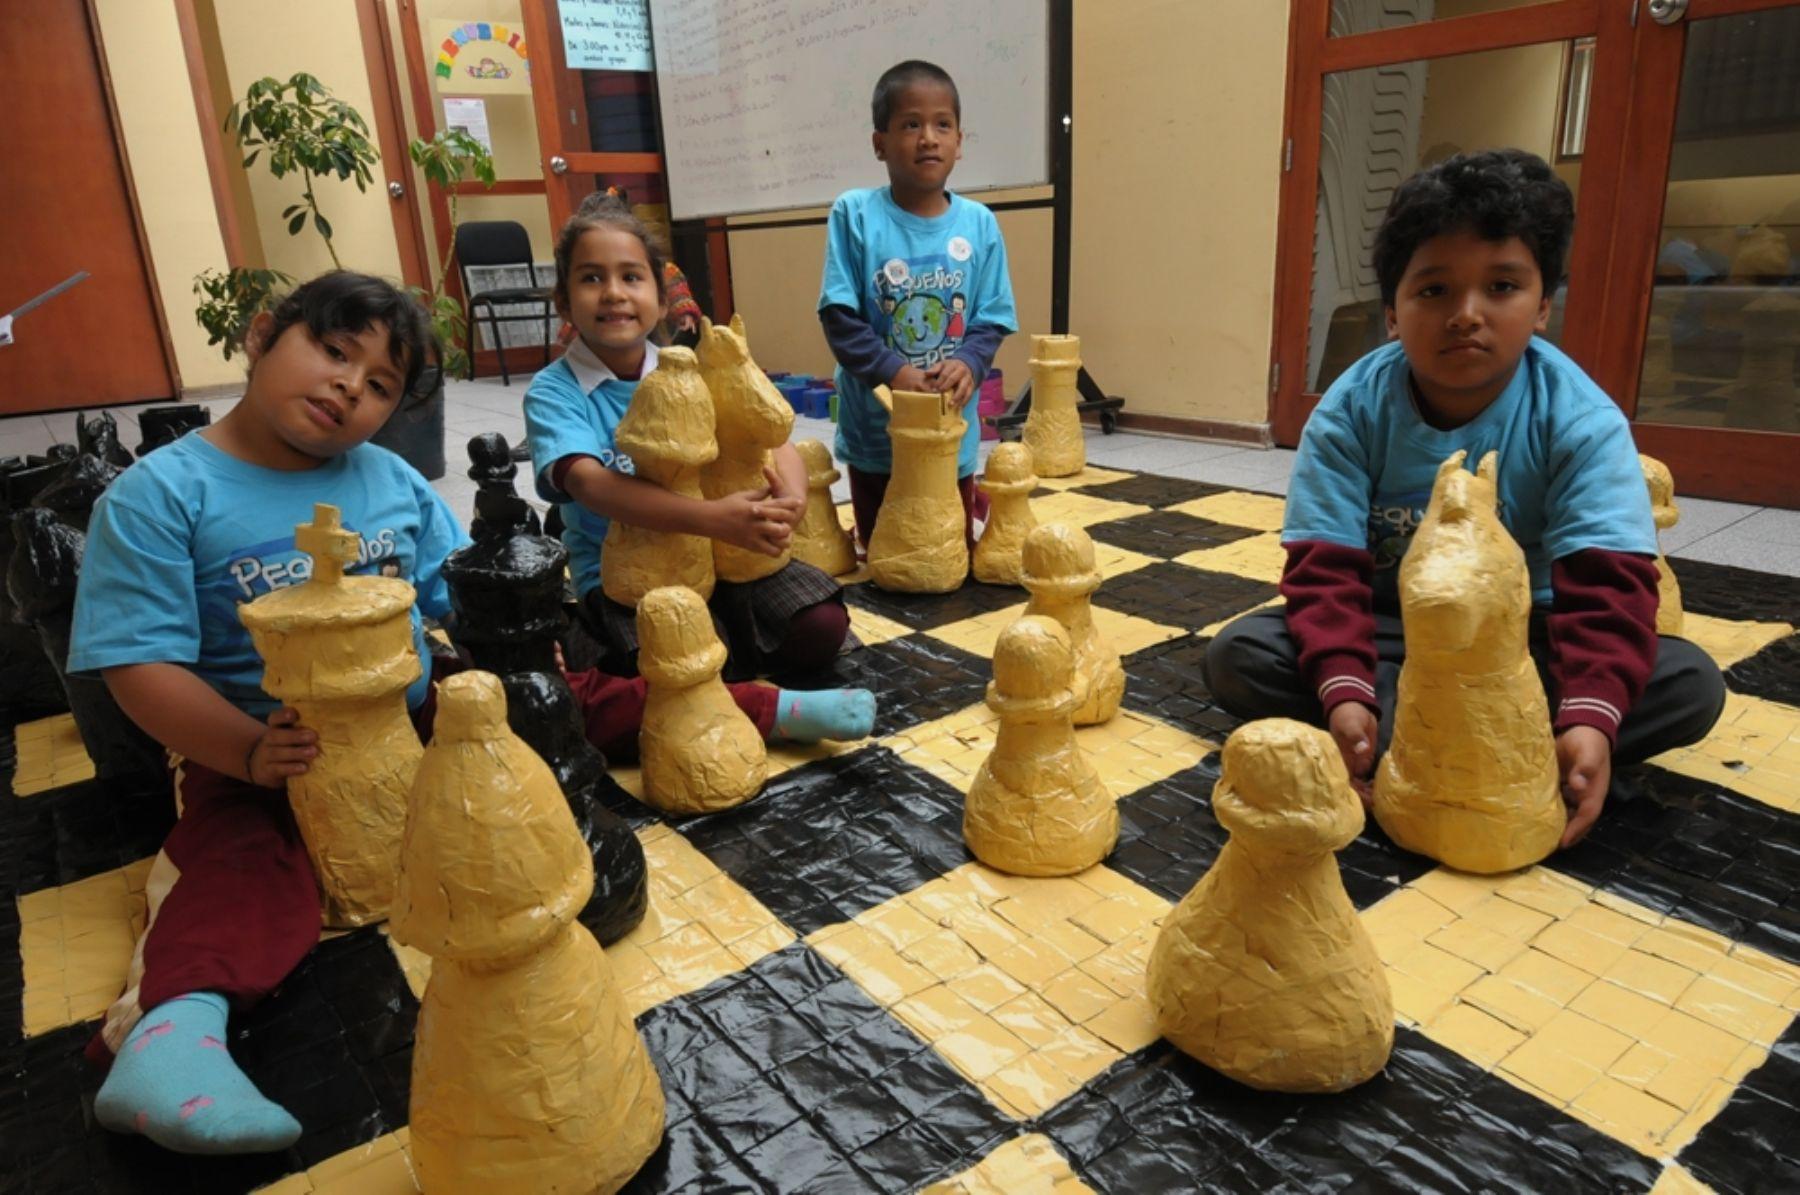 Tablero gigante de ajedrez hecho por ni os con material for Ajedrez gigante para jardin